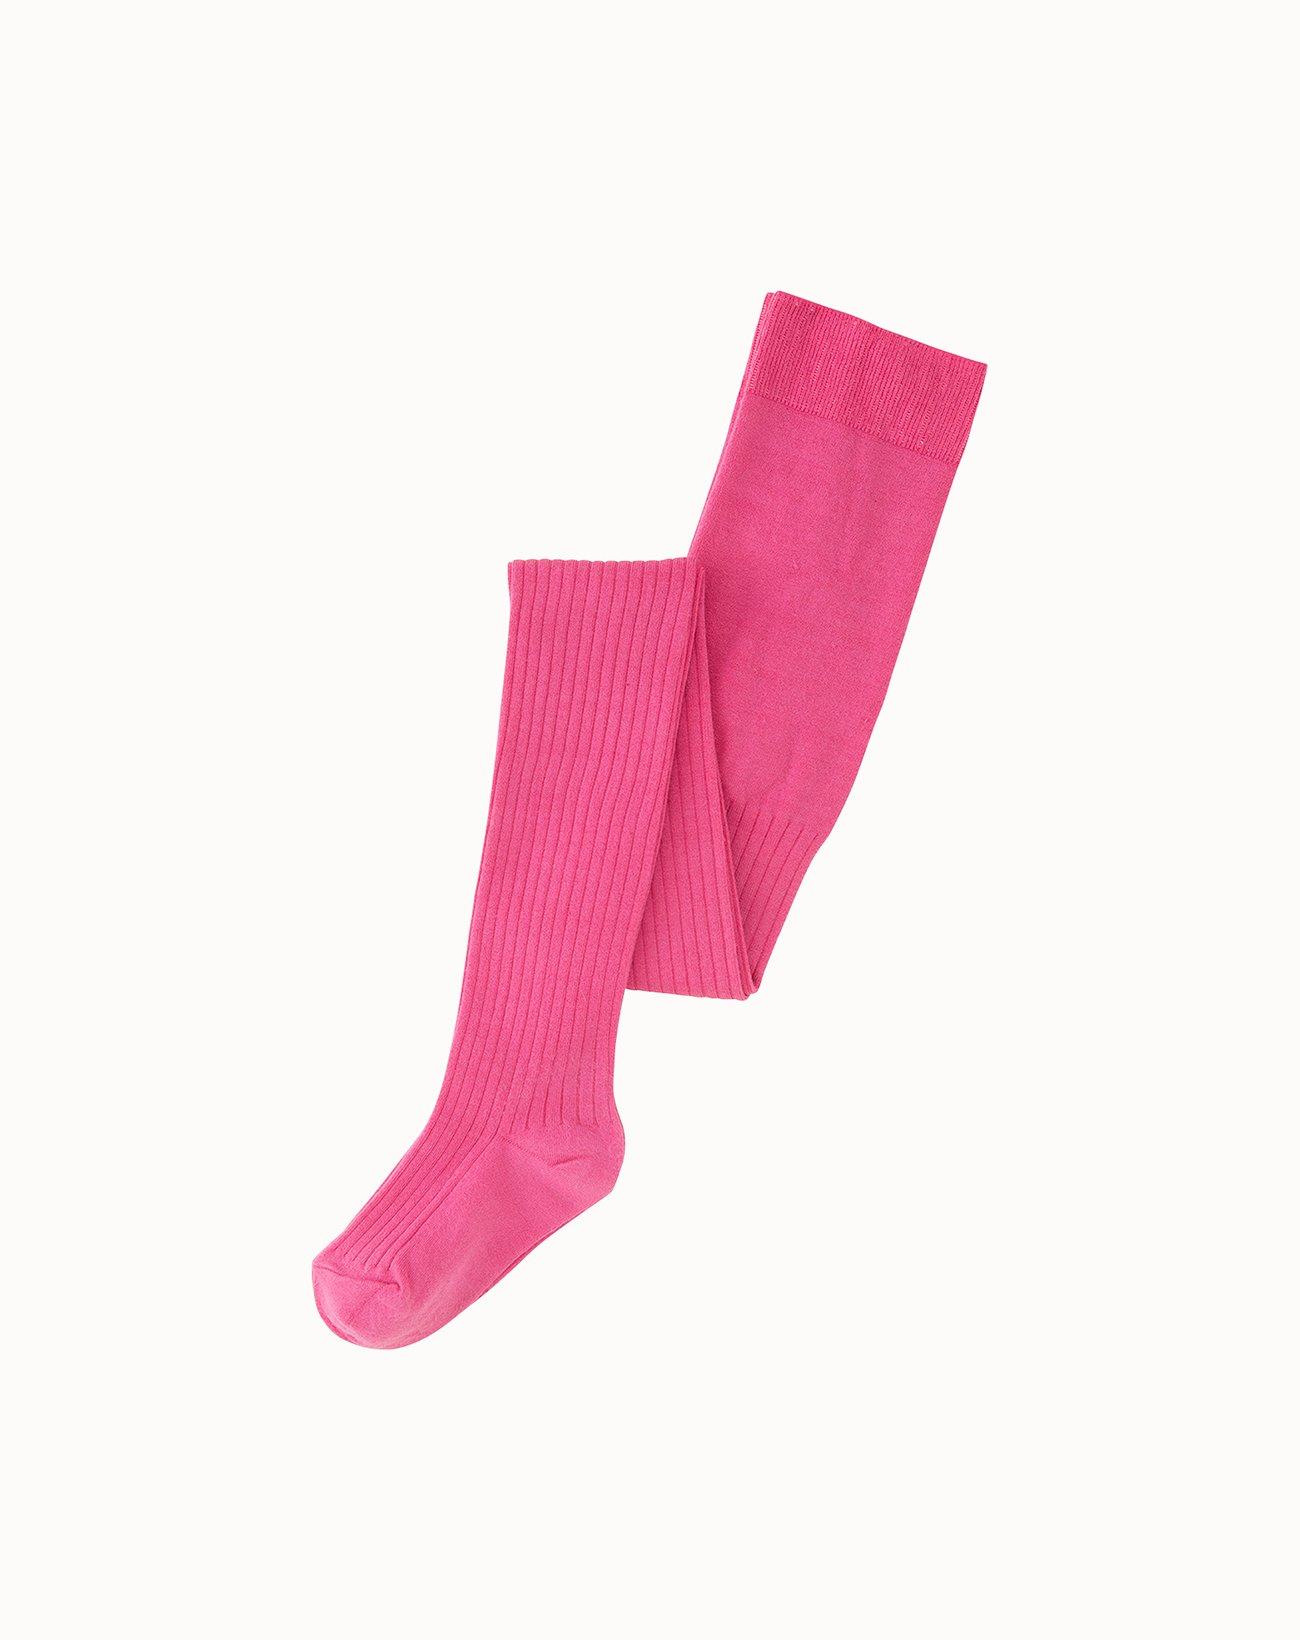 leur logette - Silk Rib Tights - Pink